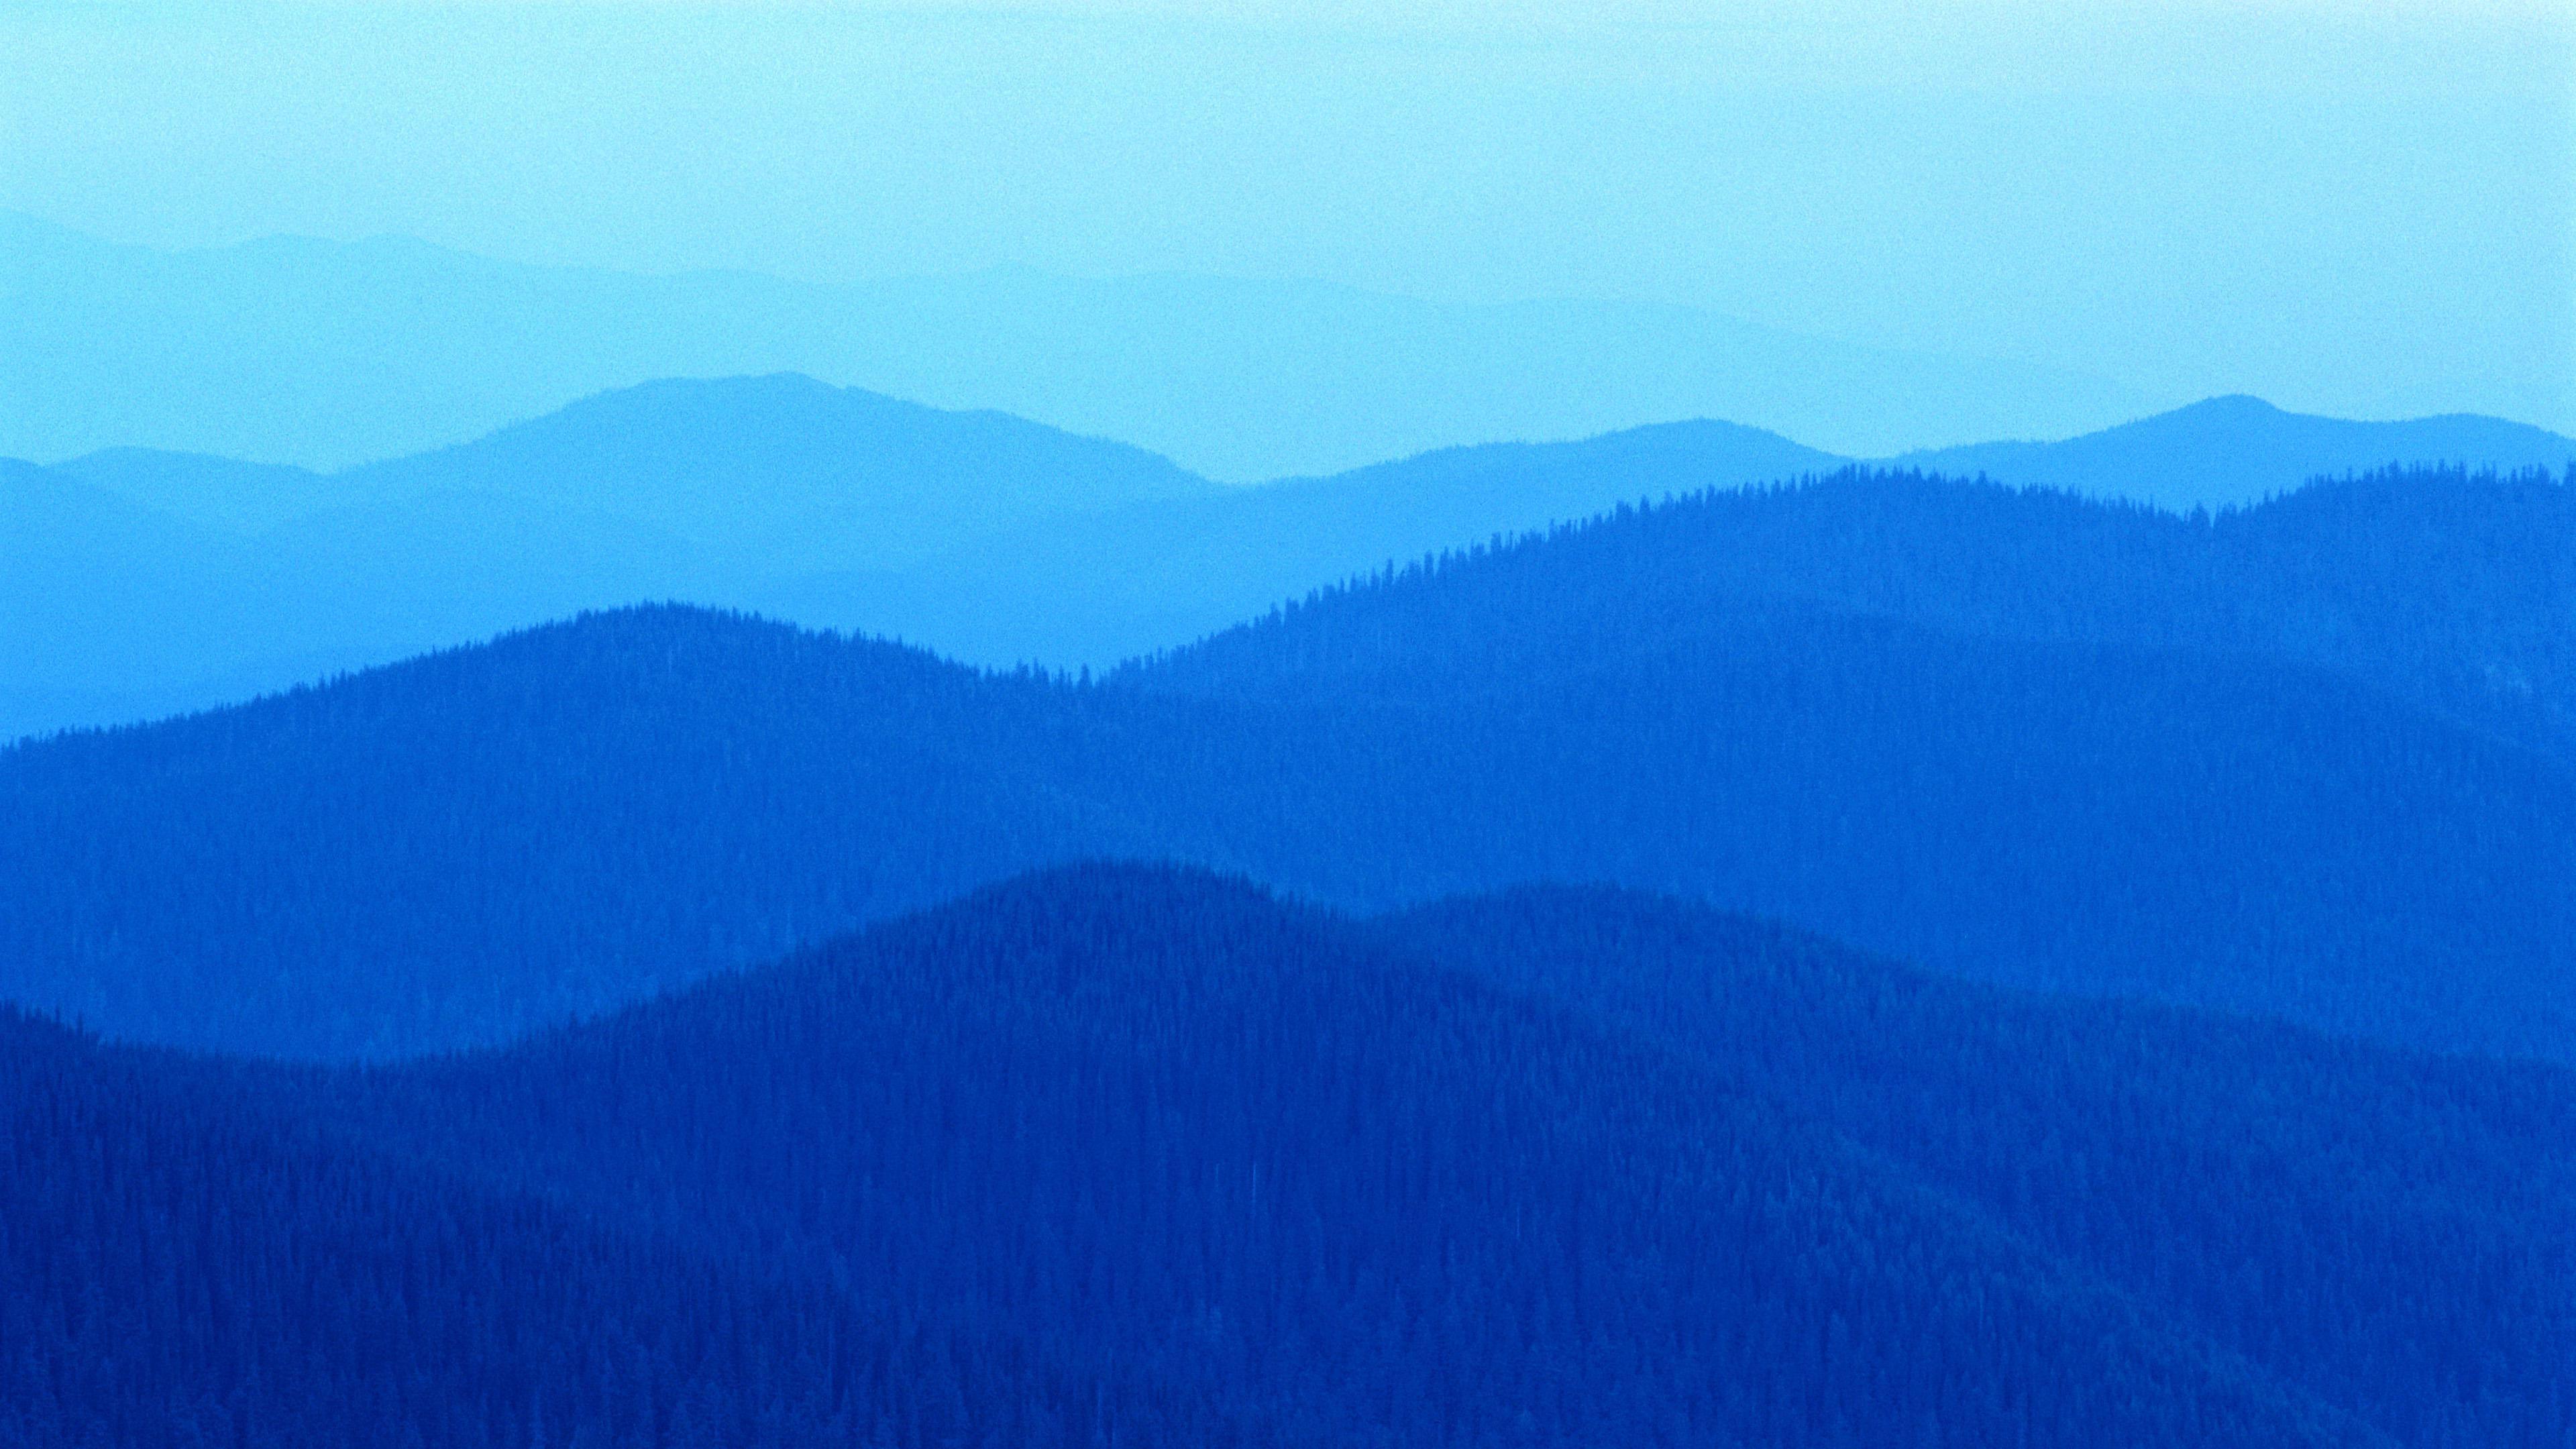 Windows XP – Blue hills [3840×2160) 4K